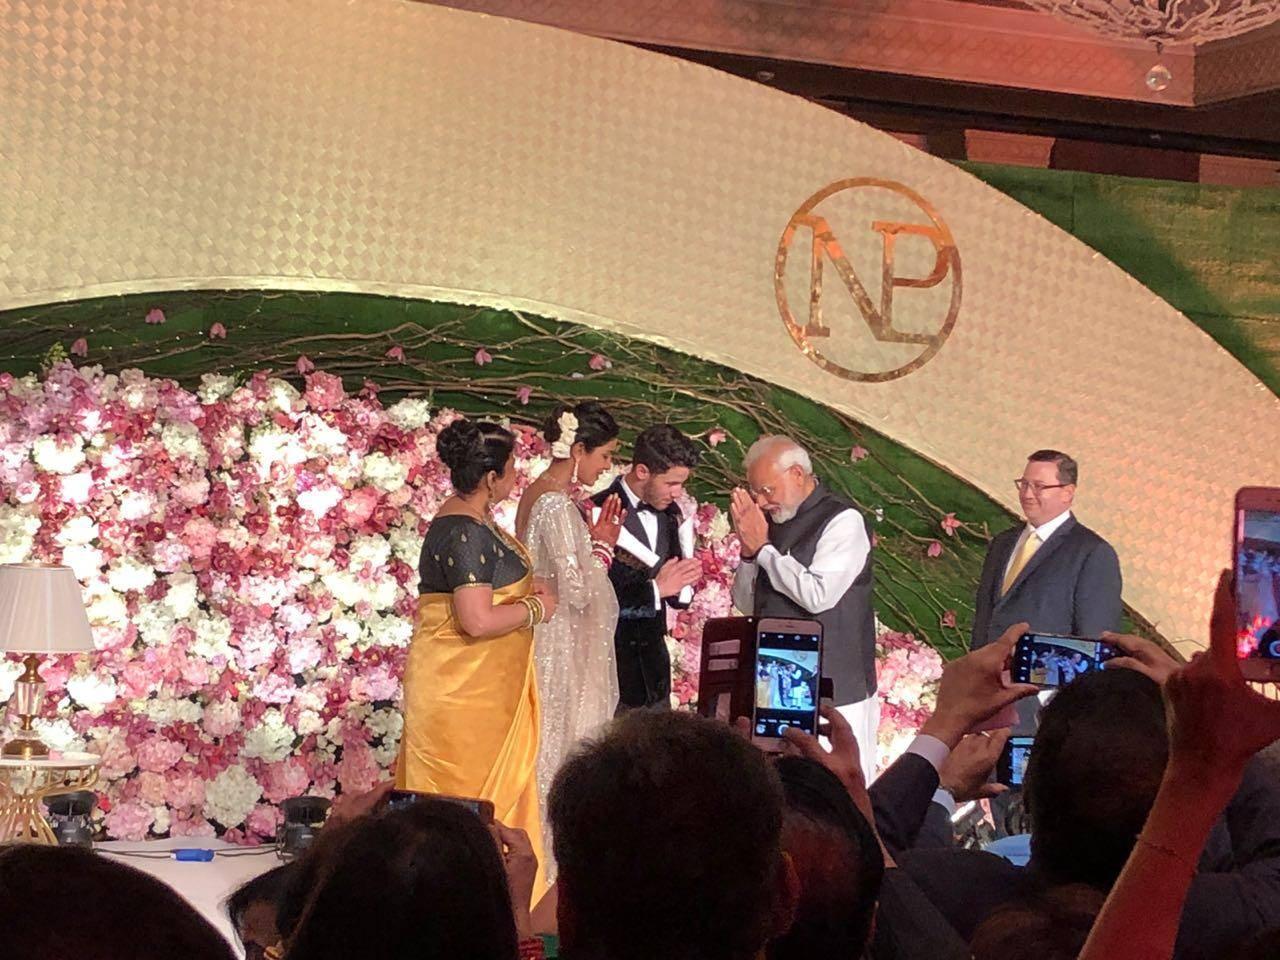 Prime Minister Narendra Modi at Priyanka Chopra and Nick Jonas wedding reception pictures, photos, images, videos